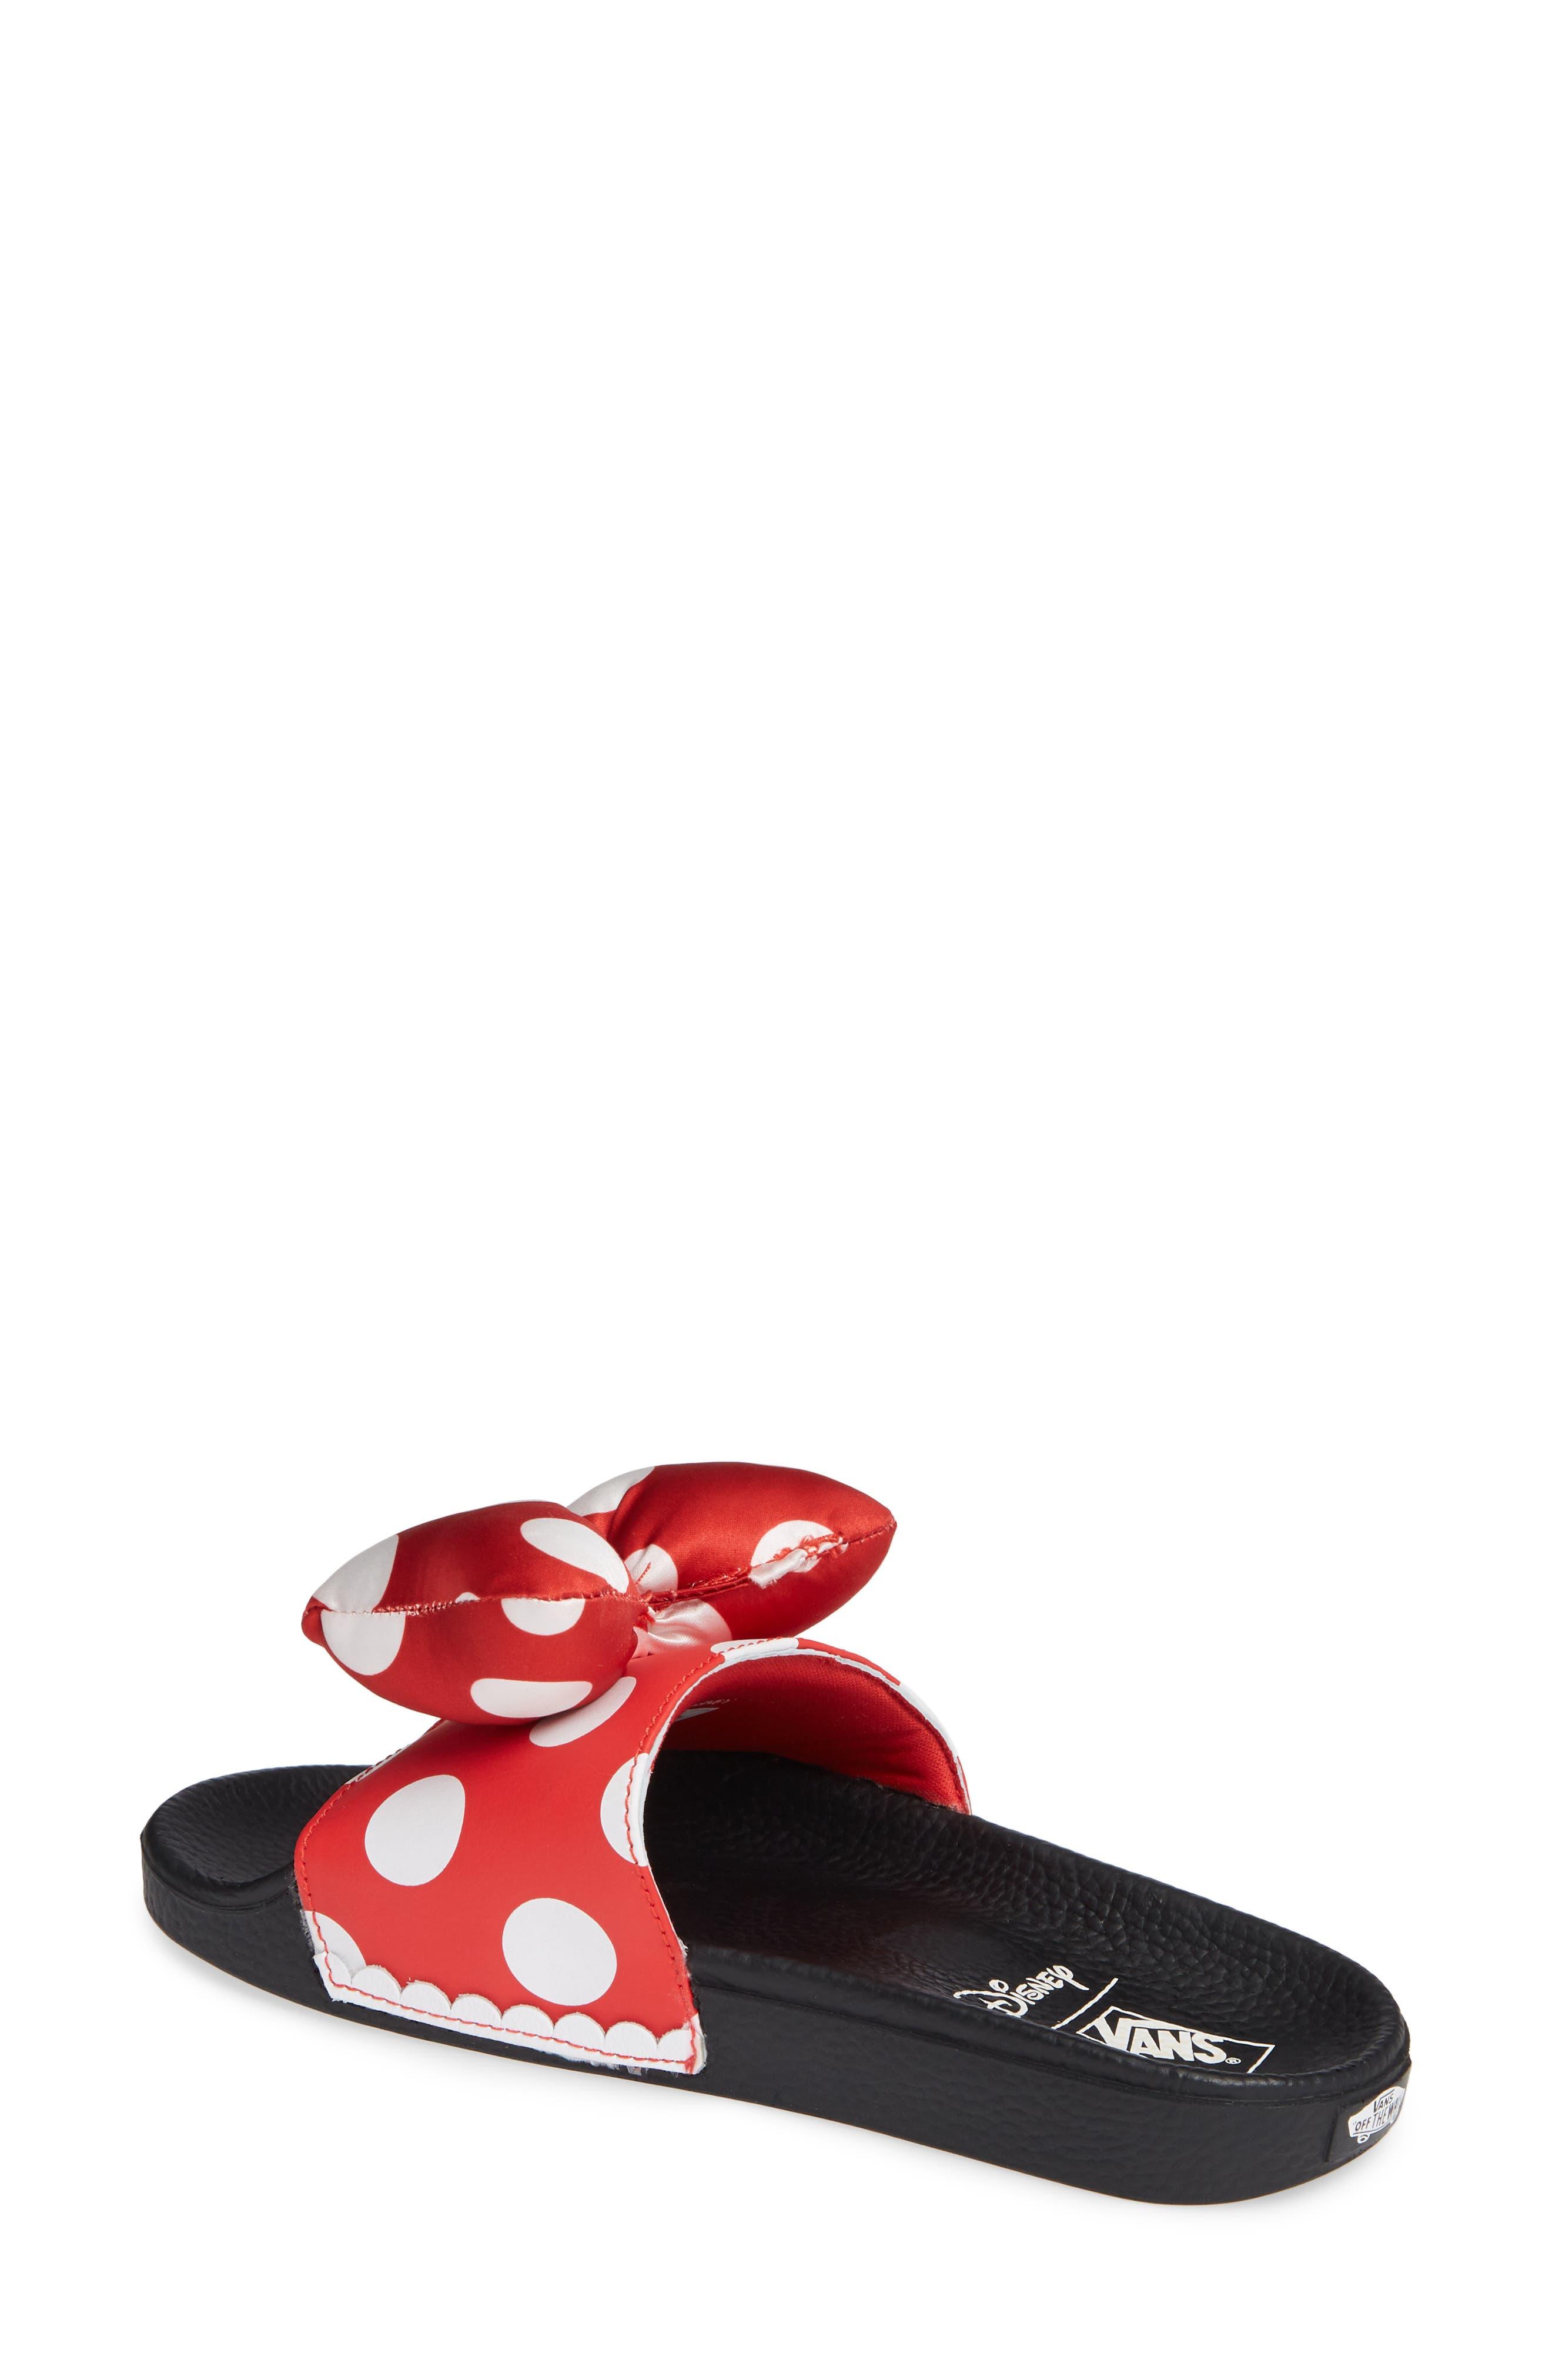 x Disney Minnie Mouse Slide Sandal,                             Alternate thumbnail 2, color,                             600